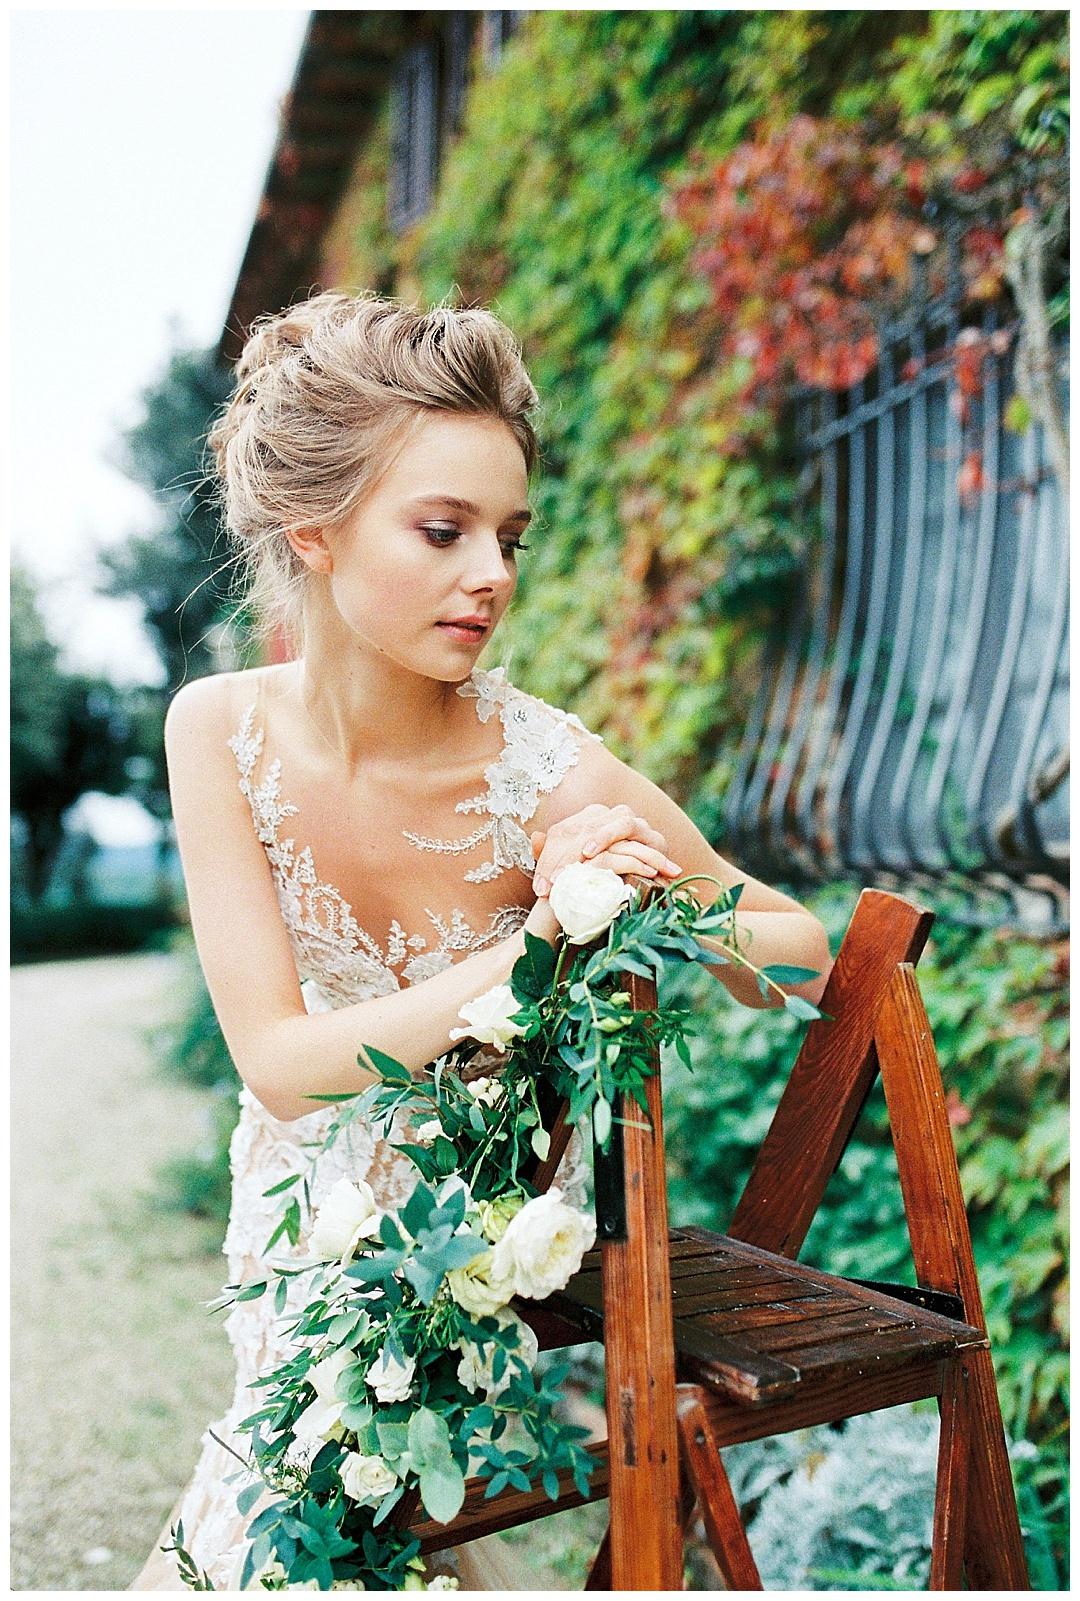 We_Can _Be_Heroes_alternative_wedding_photographer_Tuscany_wedding_film_0009